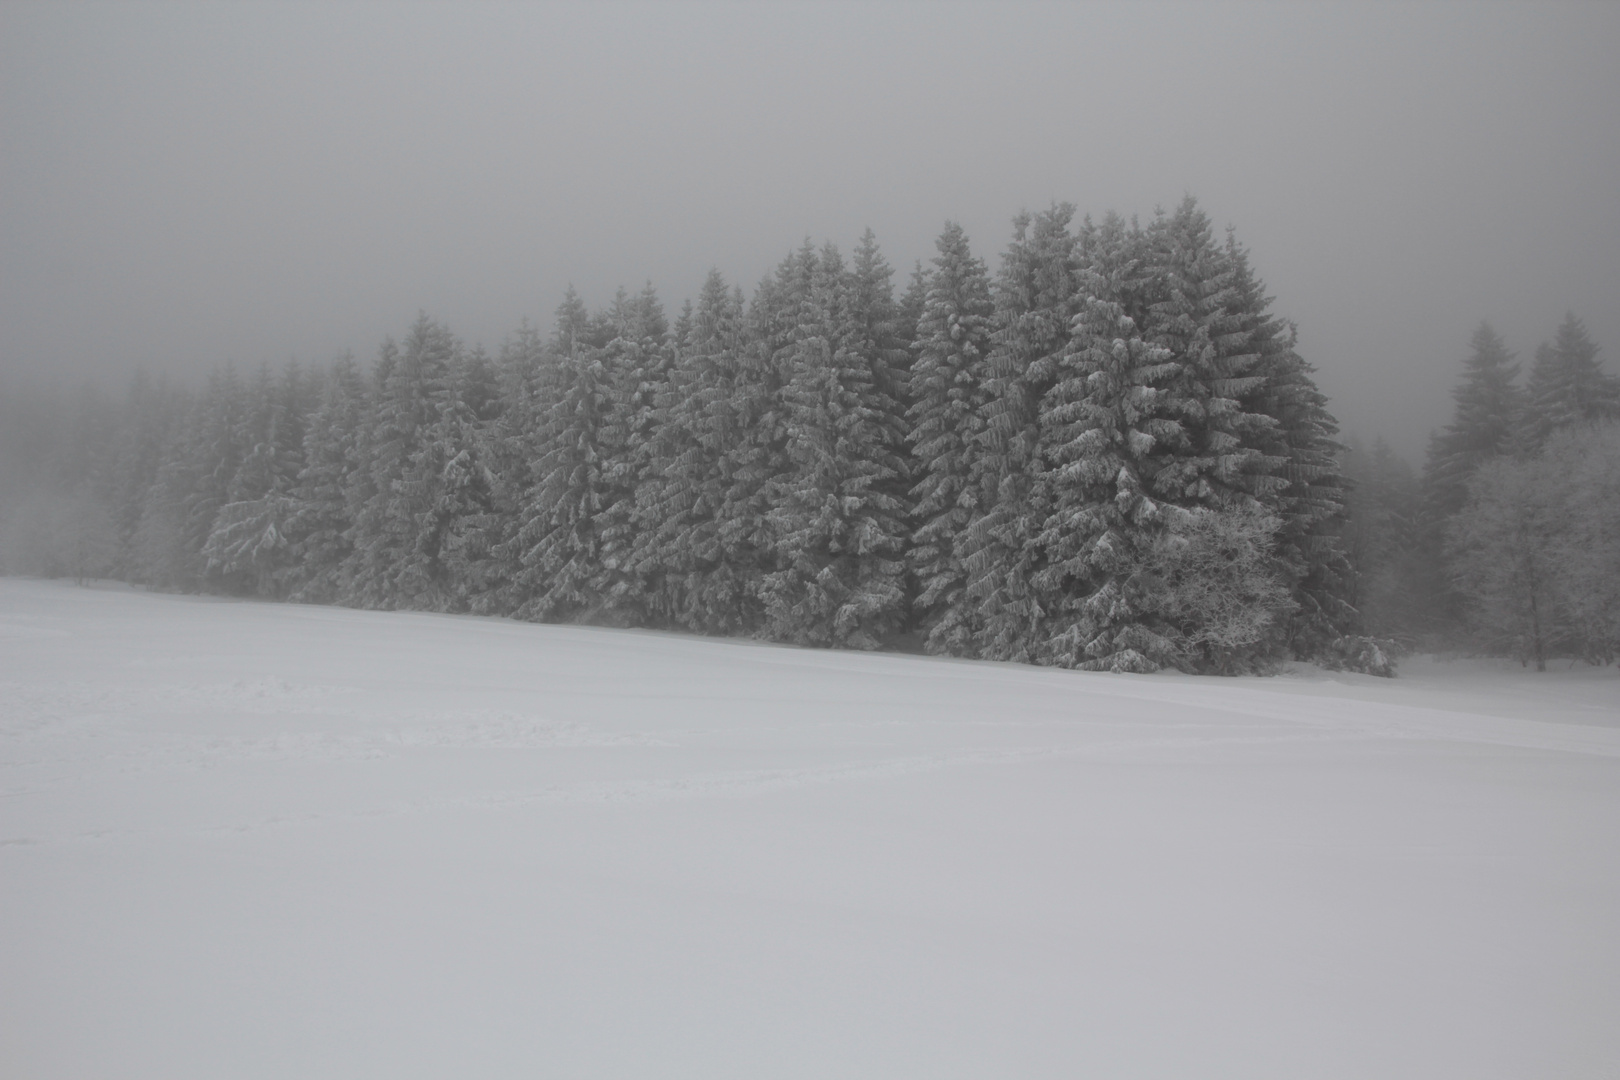 schmiedefeld 2013